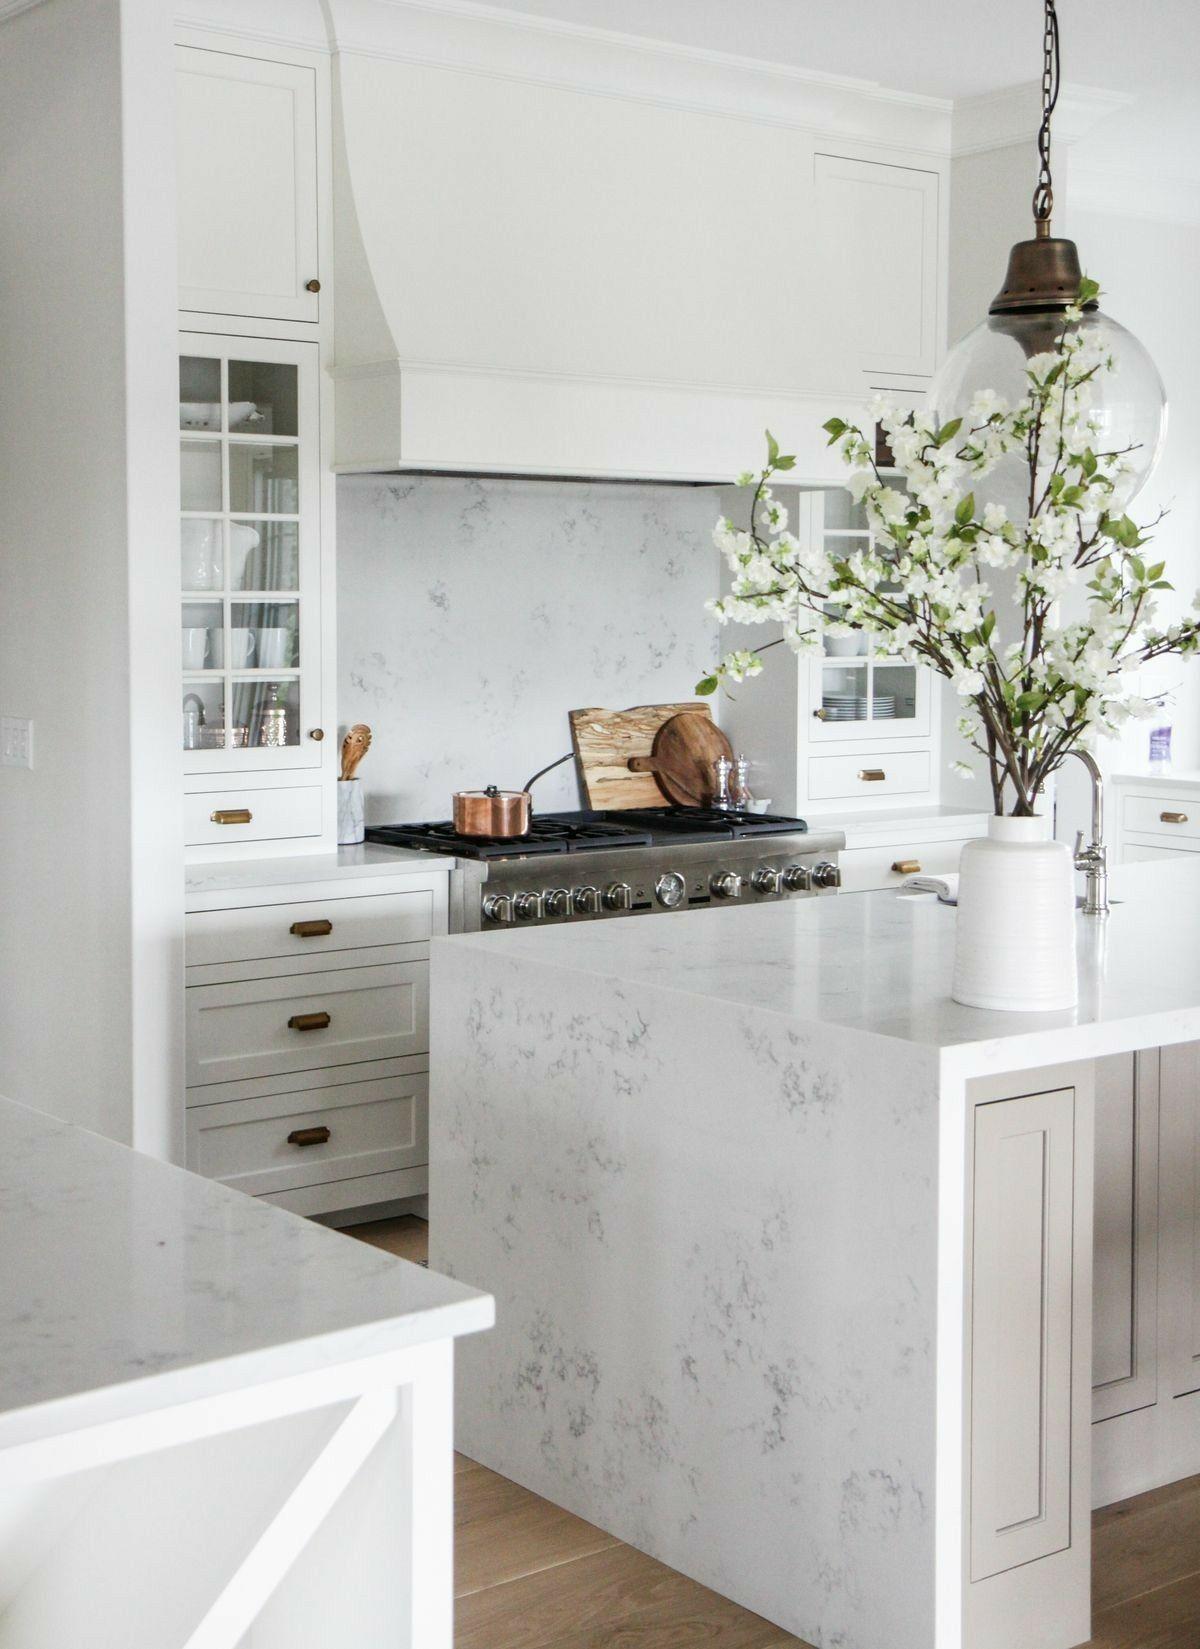 White Kitchen With Natural Accents Marble Waterfall Island And Pretty White Branches Clean Crisp Interior Design Kitchen Kitchen Interior Home Decor Kitchen